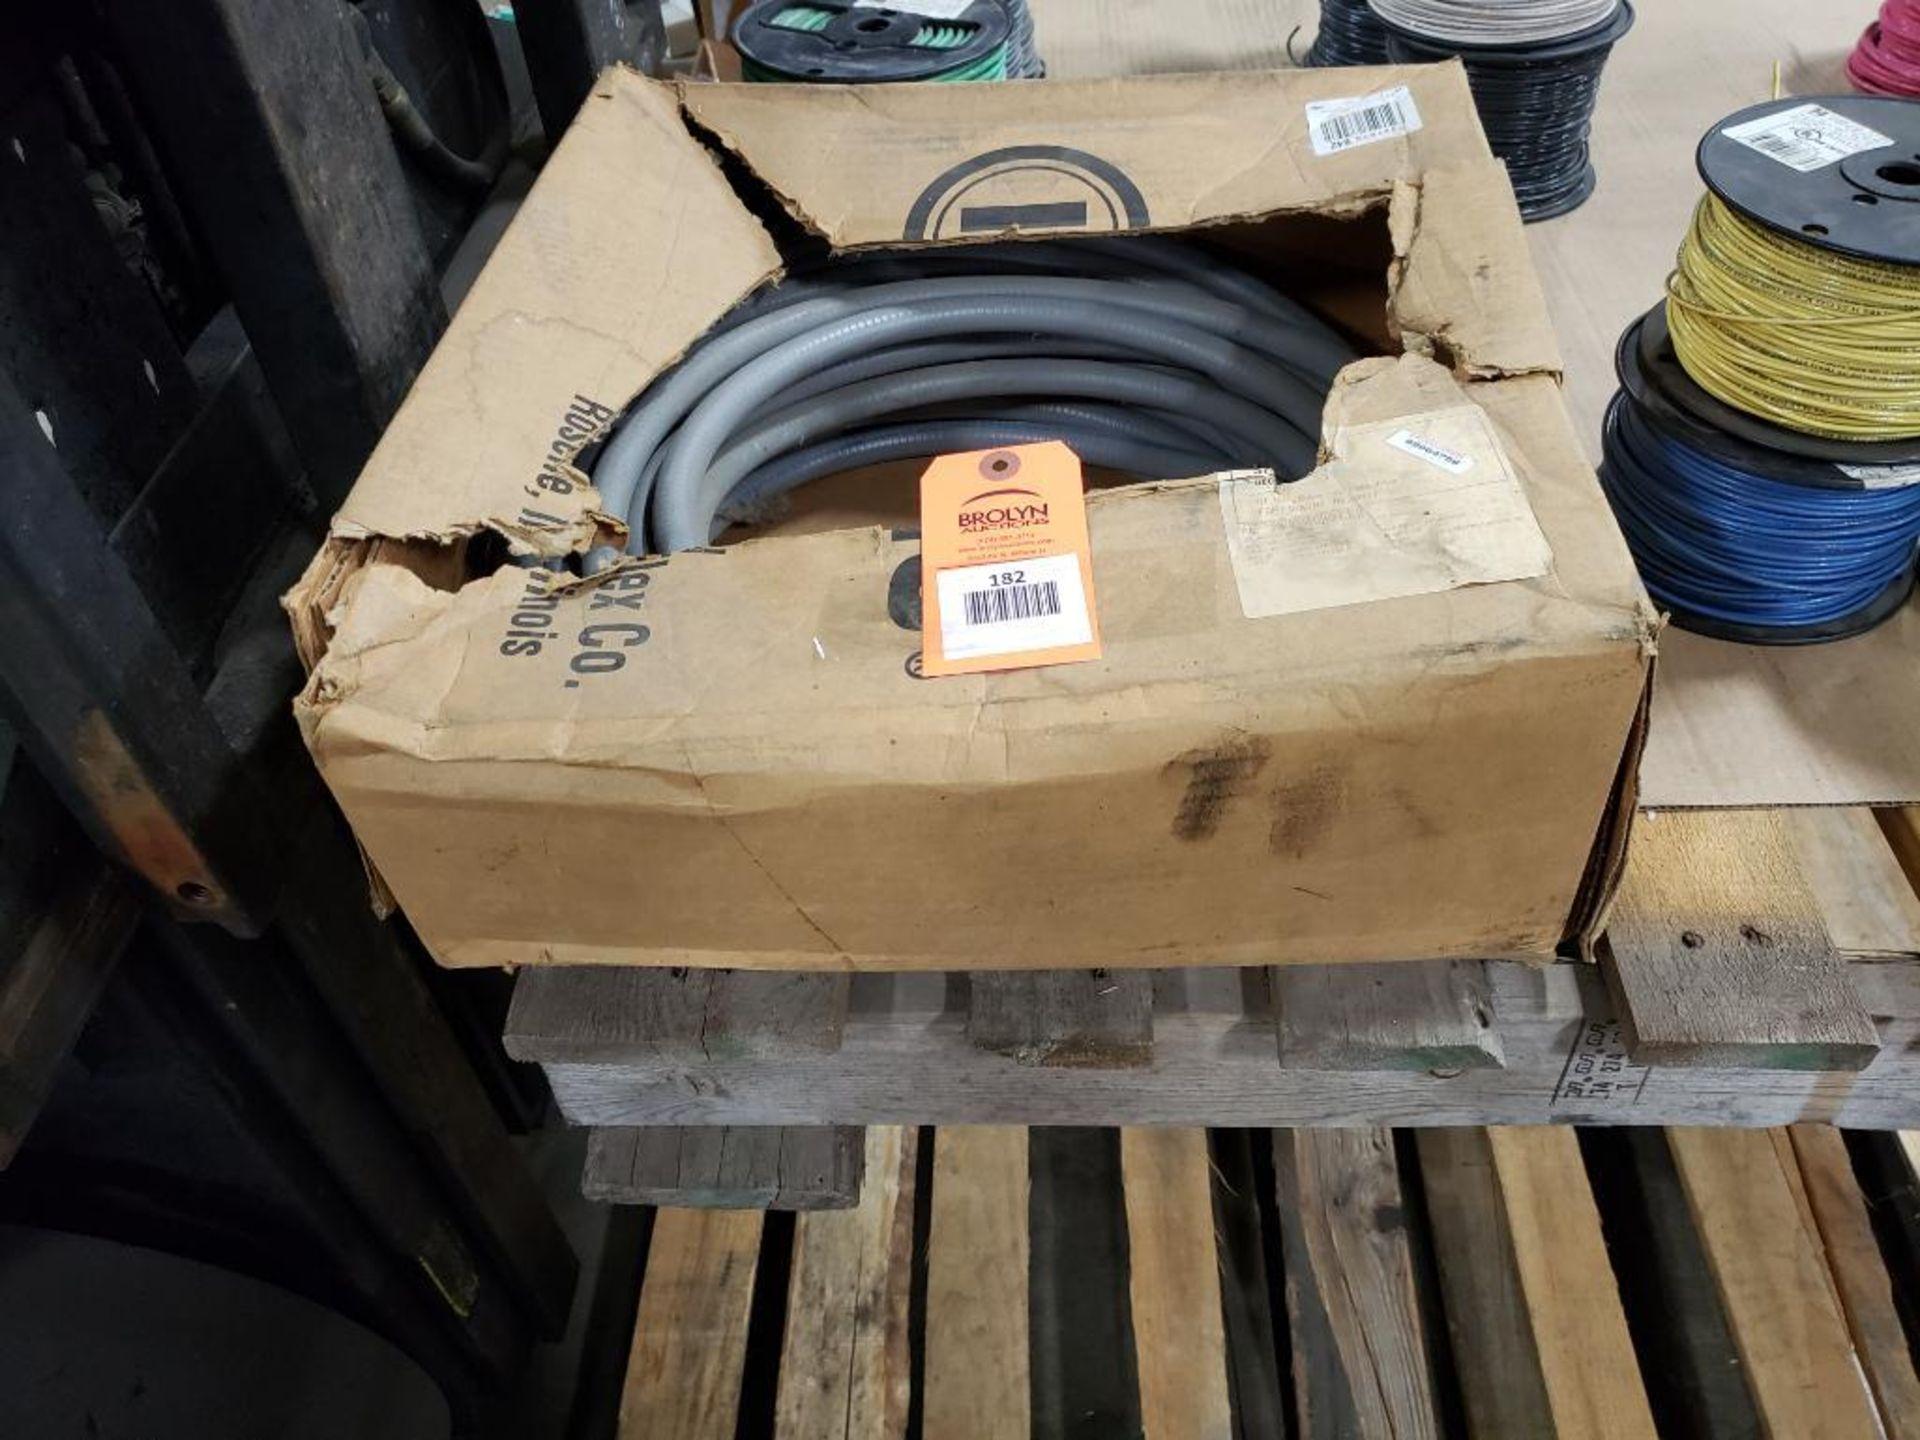 "Liquatite 5YH52 3/8"" Flexible conduit. 100Ft."